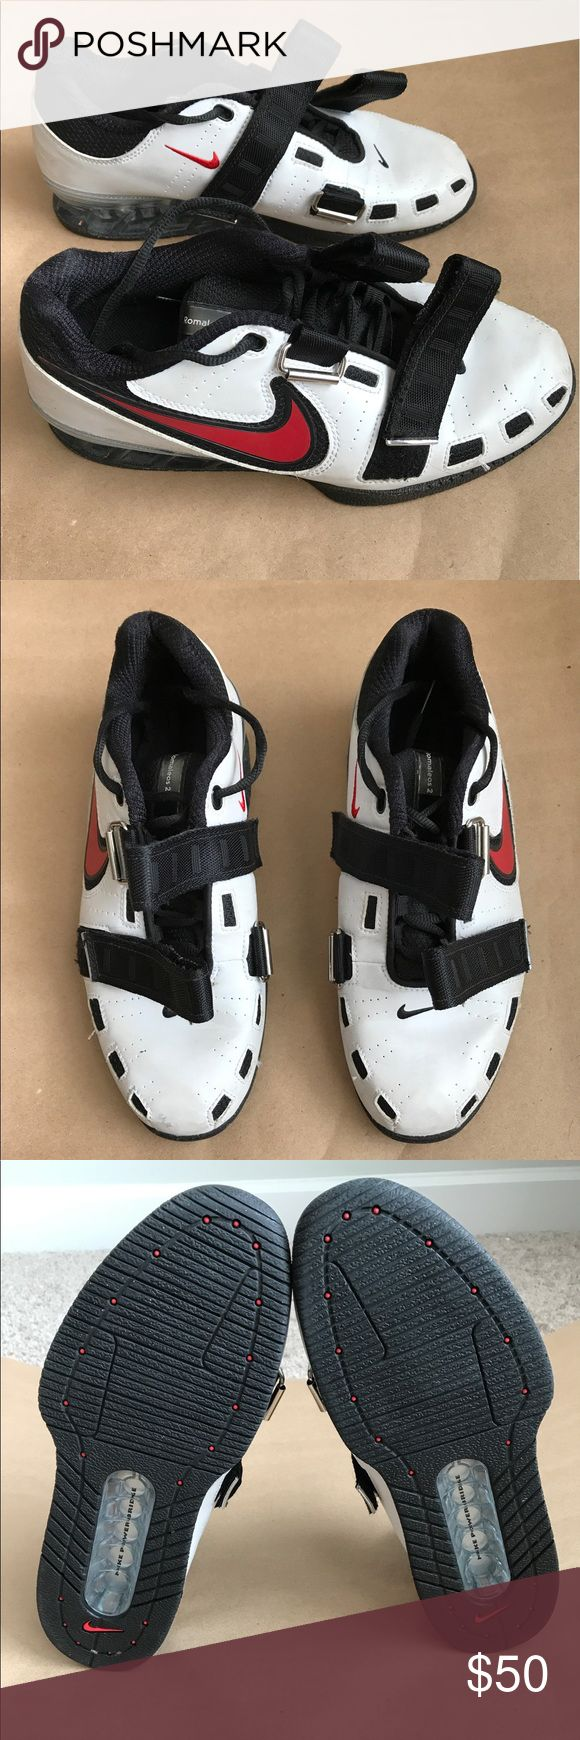 Nike Lifting Shoes Romaleos 2 Nike Shoes Athletic Shoes